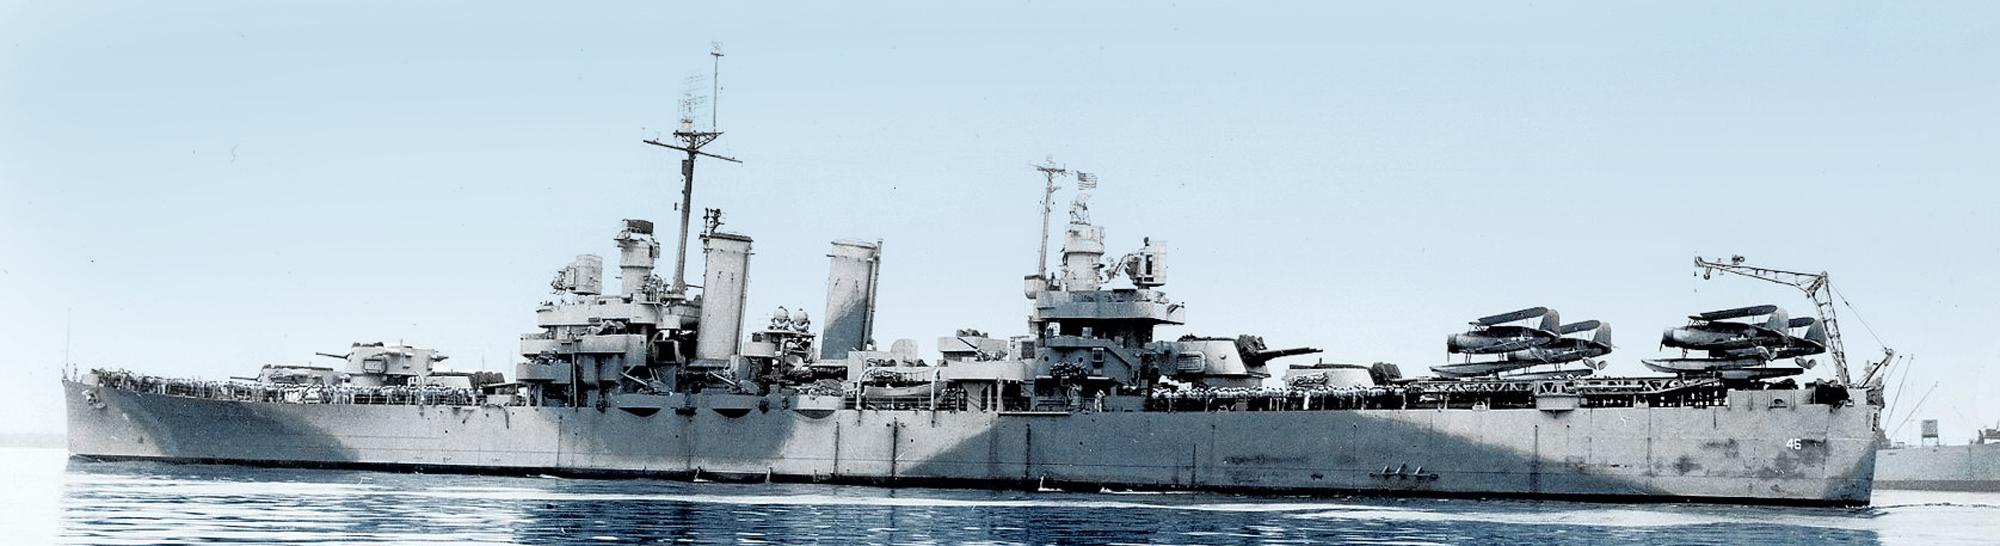 WW2 American Cruisers